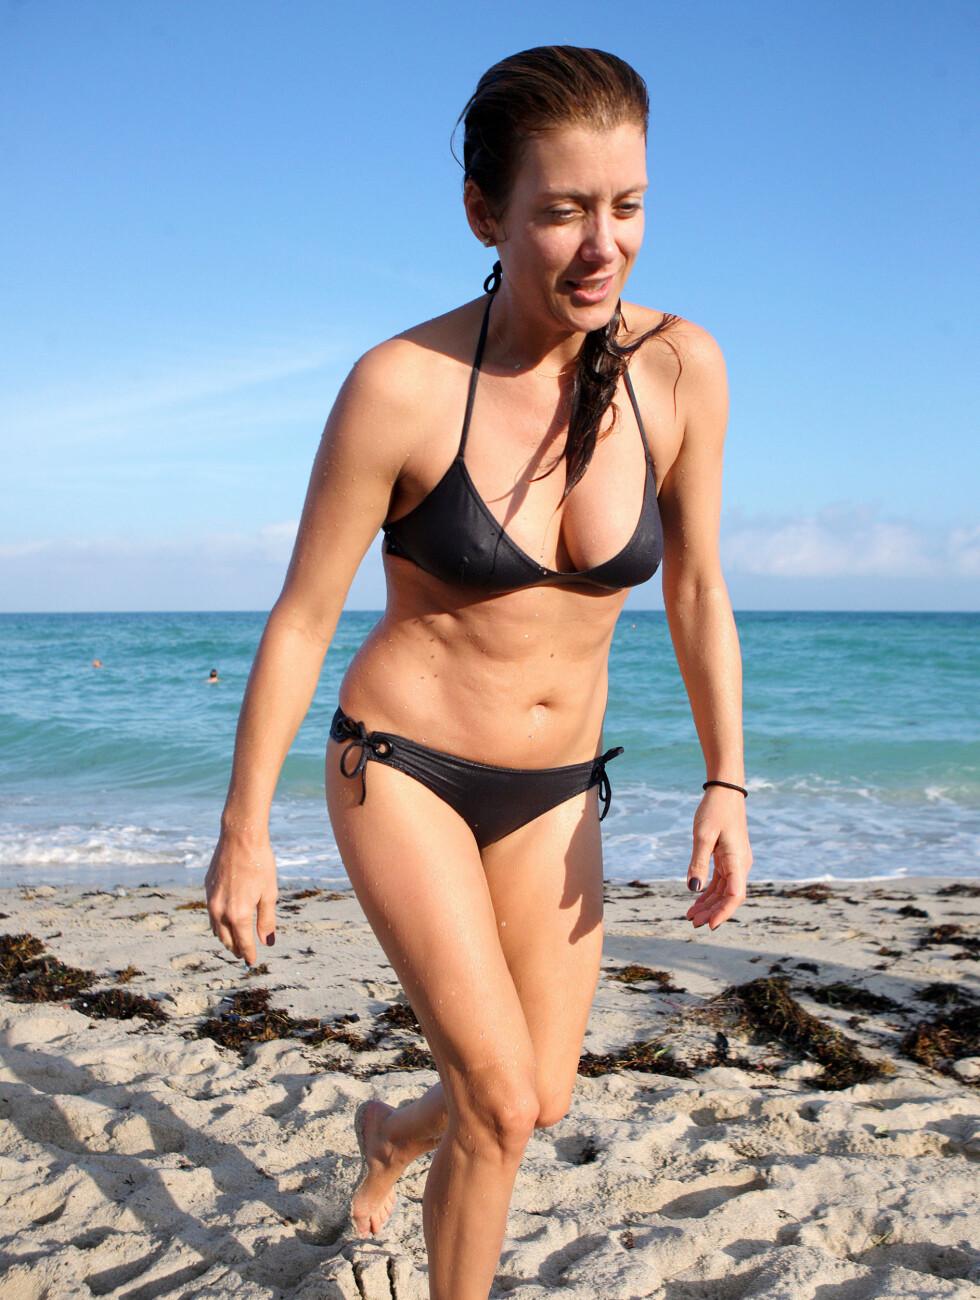 PÅ STRANDEN: Kate Walsh viste fram kroppen på South Beach i Miami. Foto: All Over Press